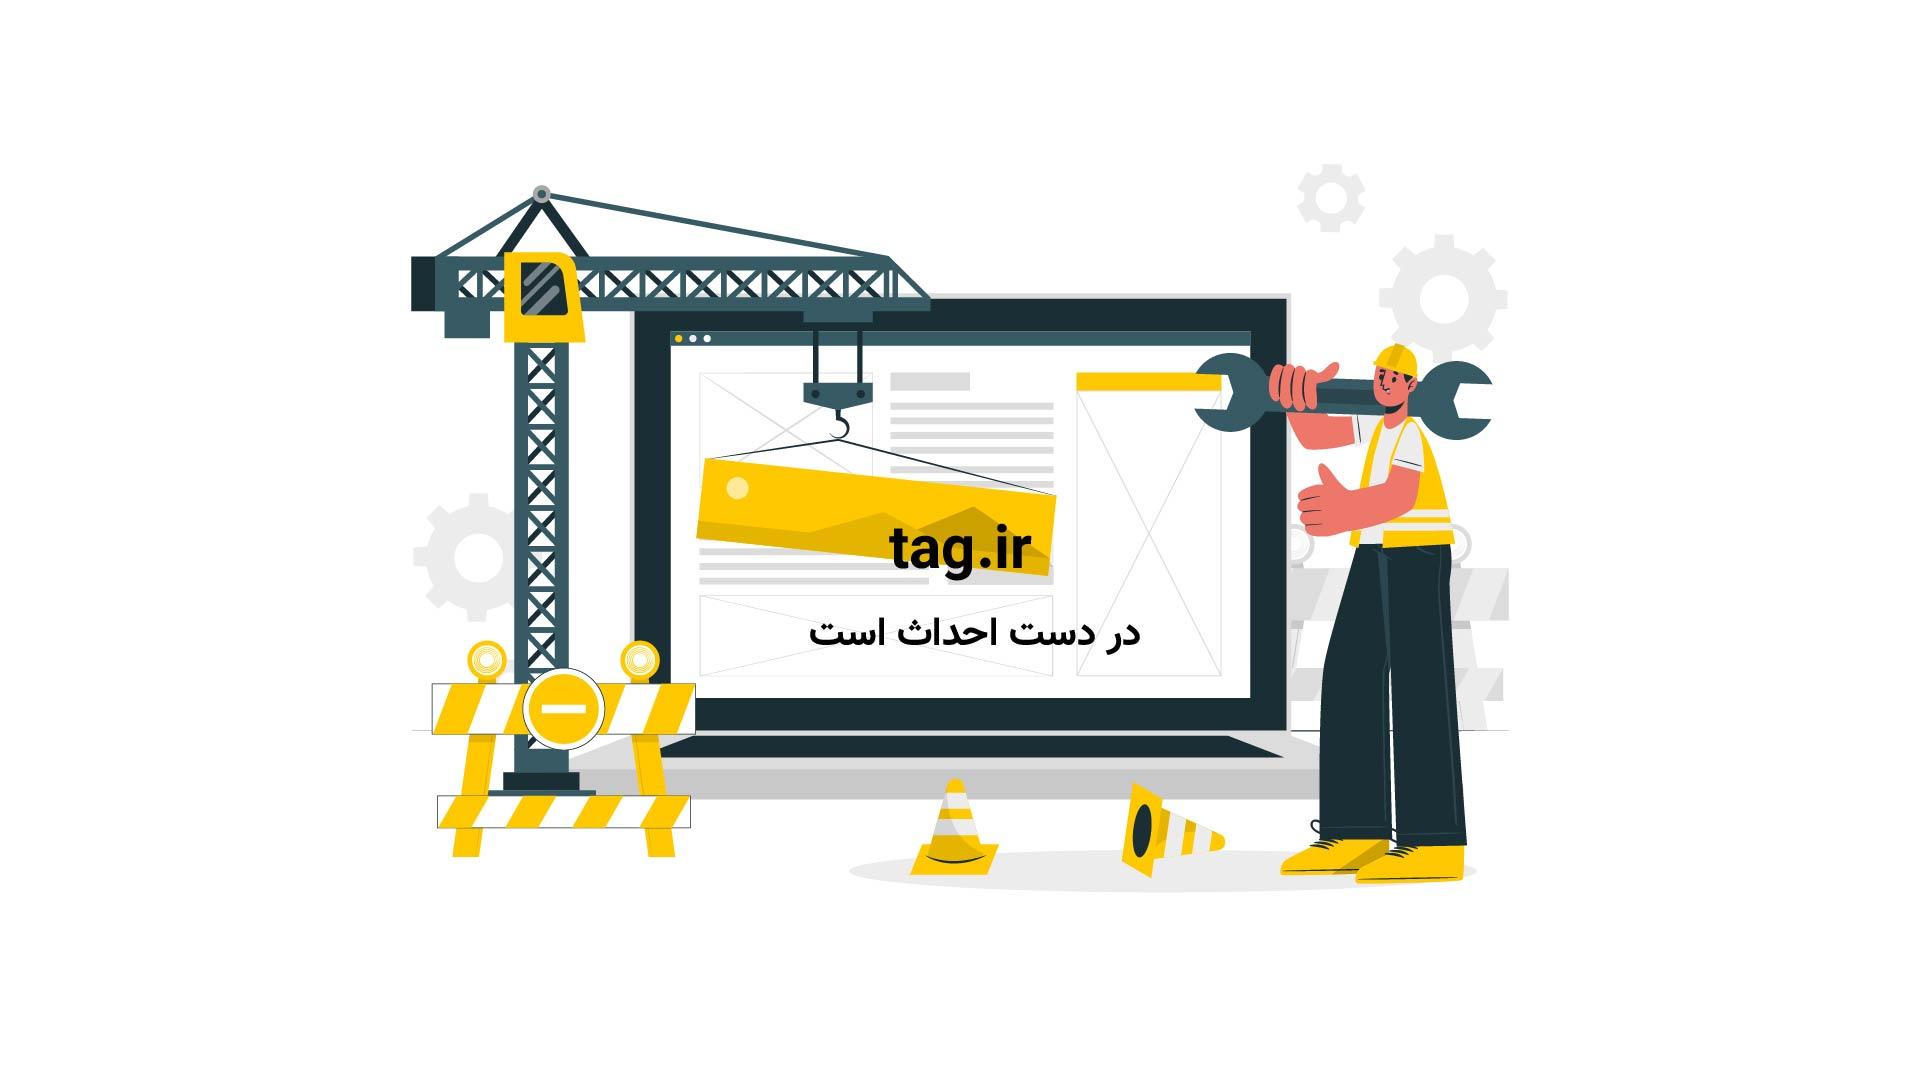 عینک-مردانه | تگ